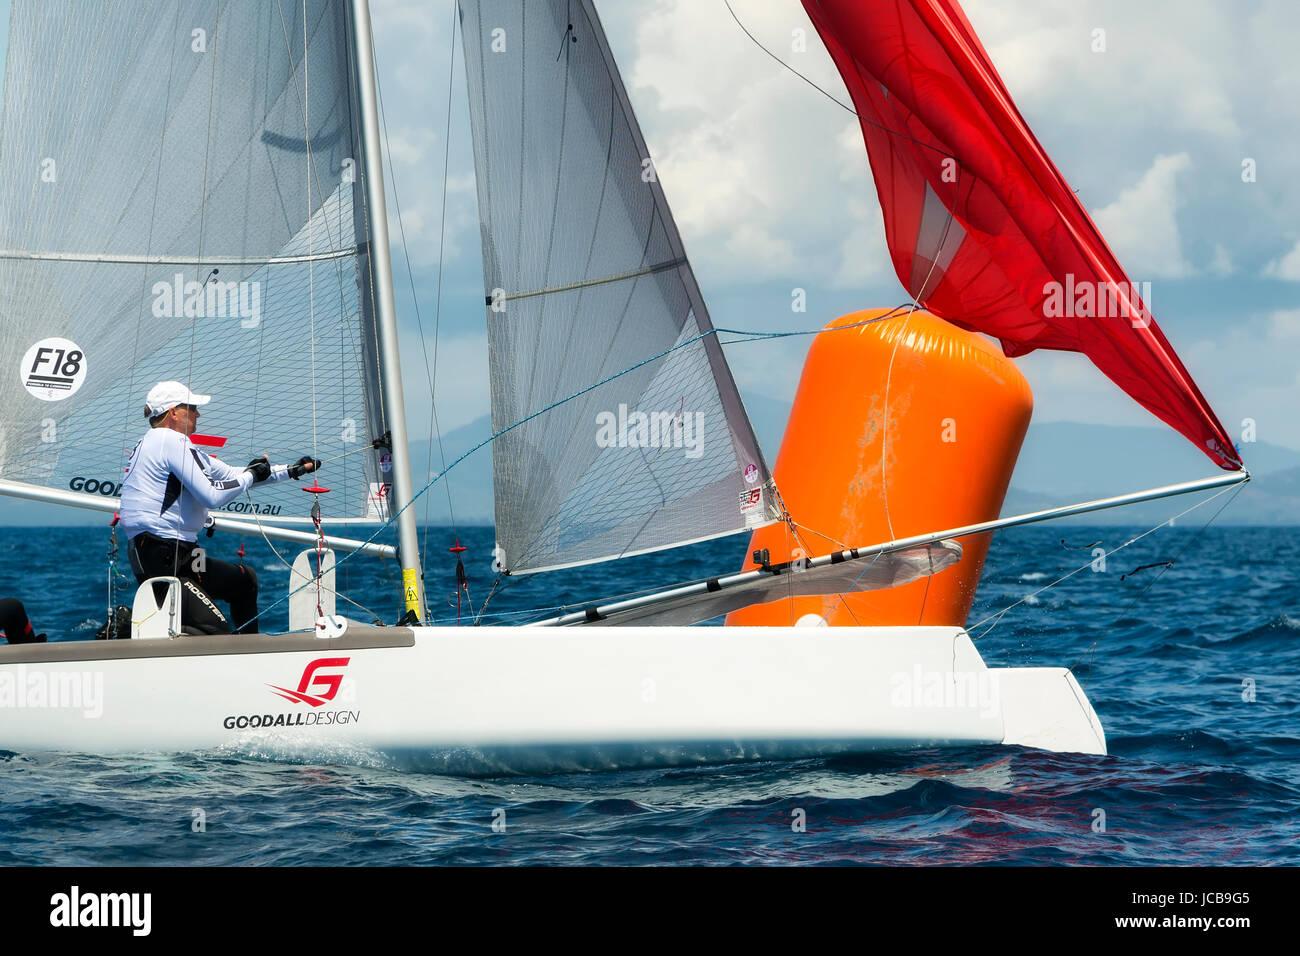 PUNTA ALA - 3 JUNE: athlete sailing on Formula 18 national catamaran regatta, on June 3 2016 in Punta Ala, Italy - Stock Image